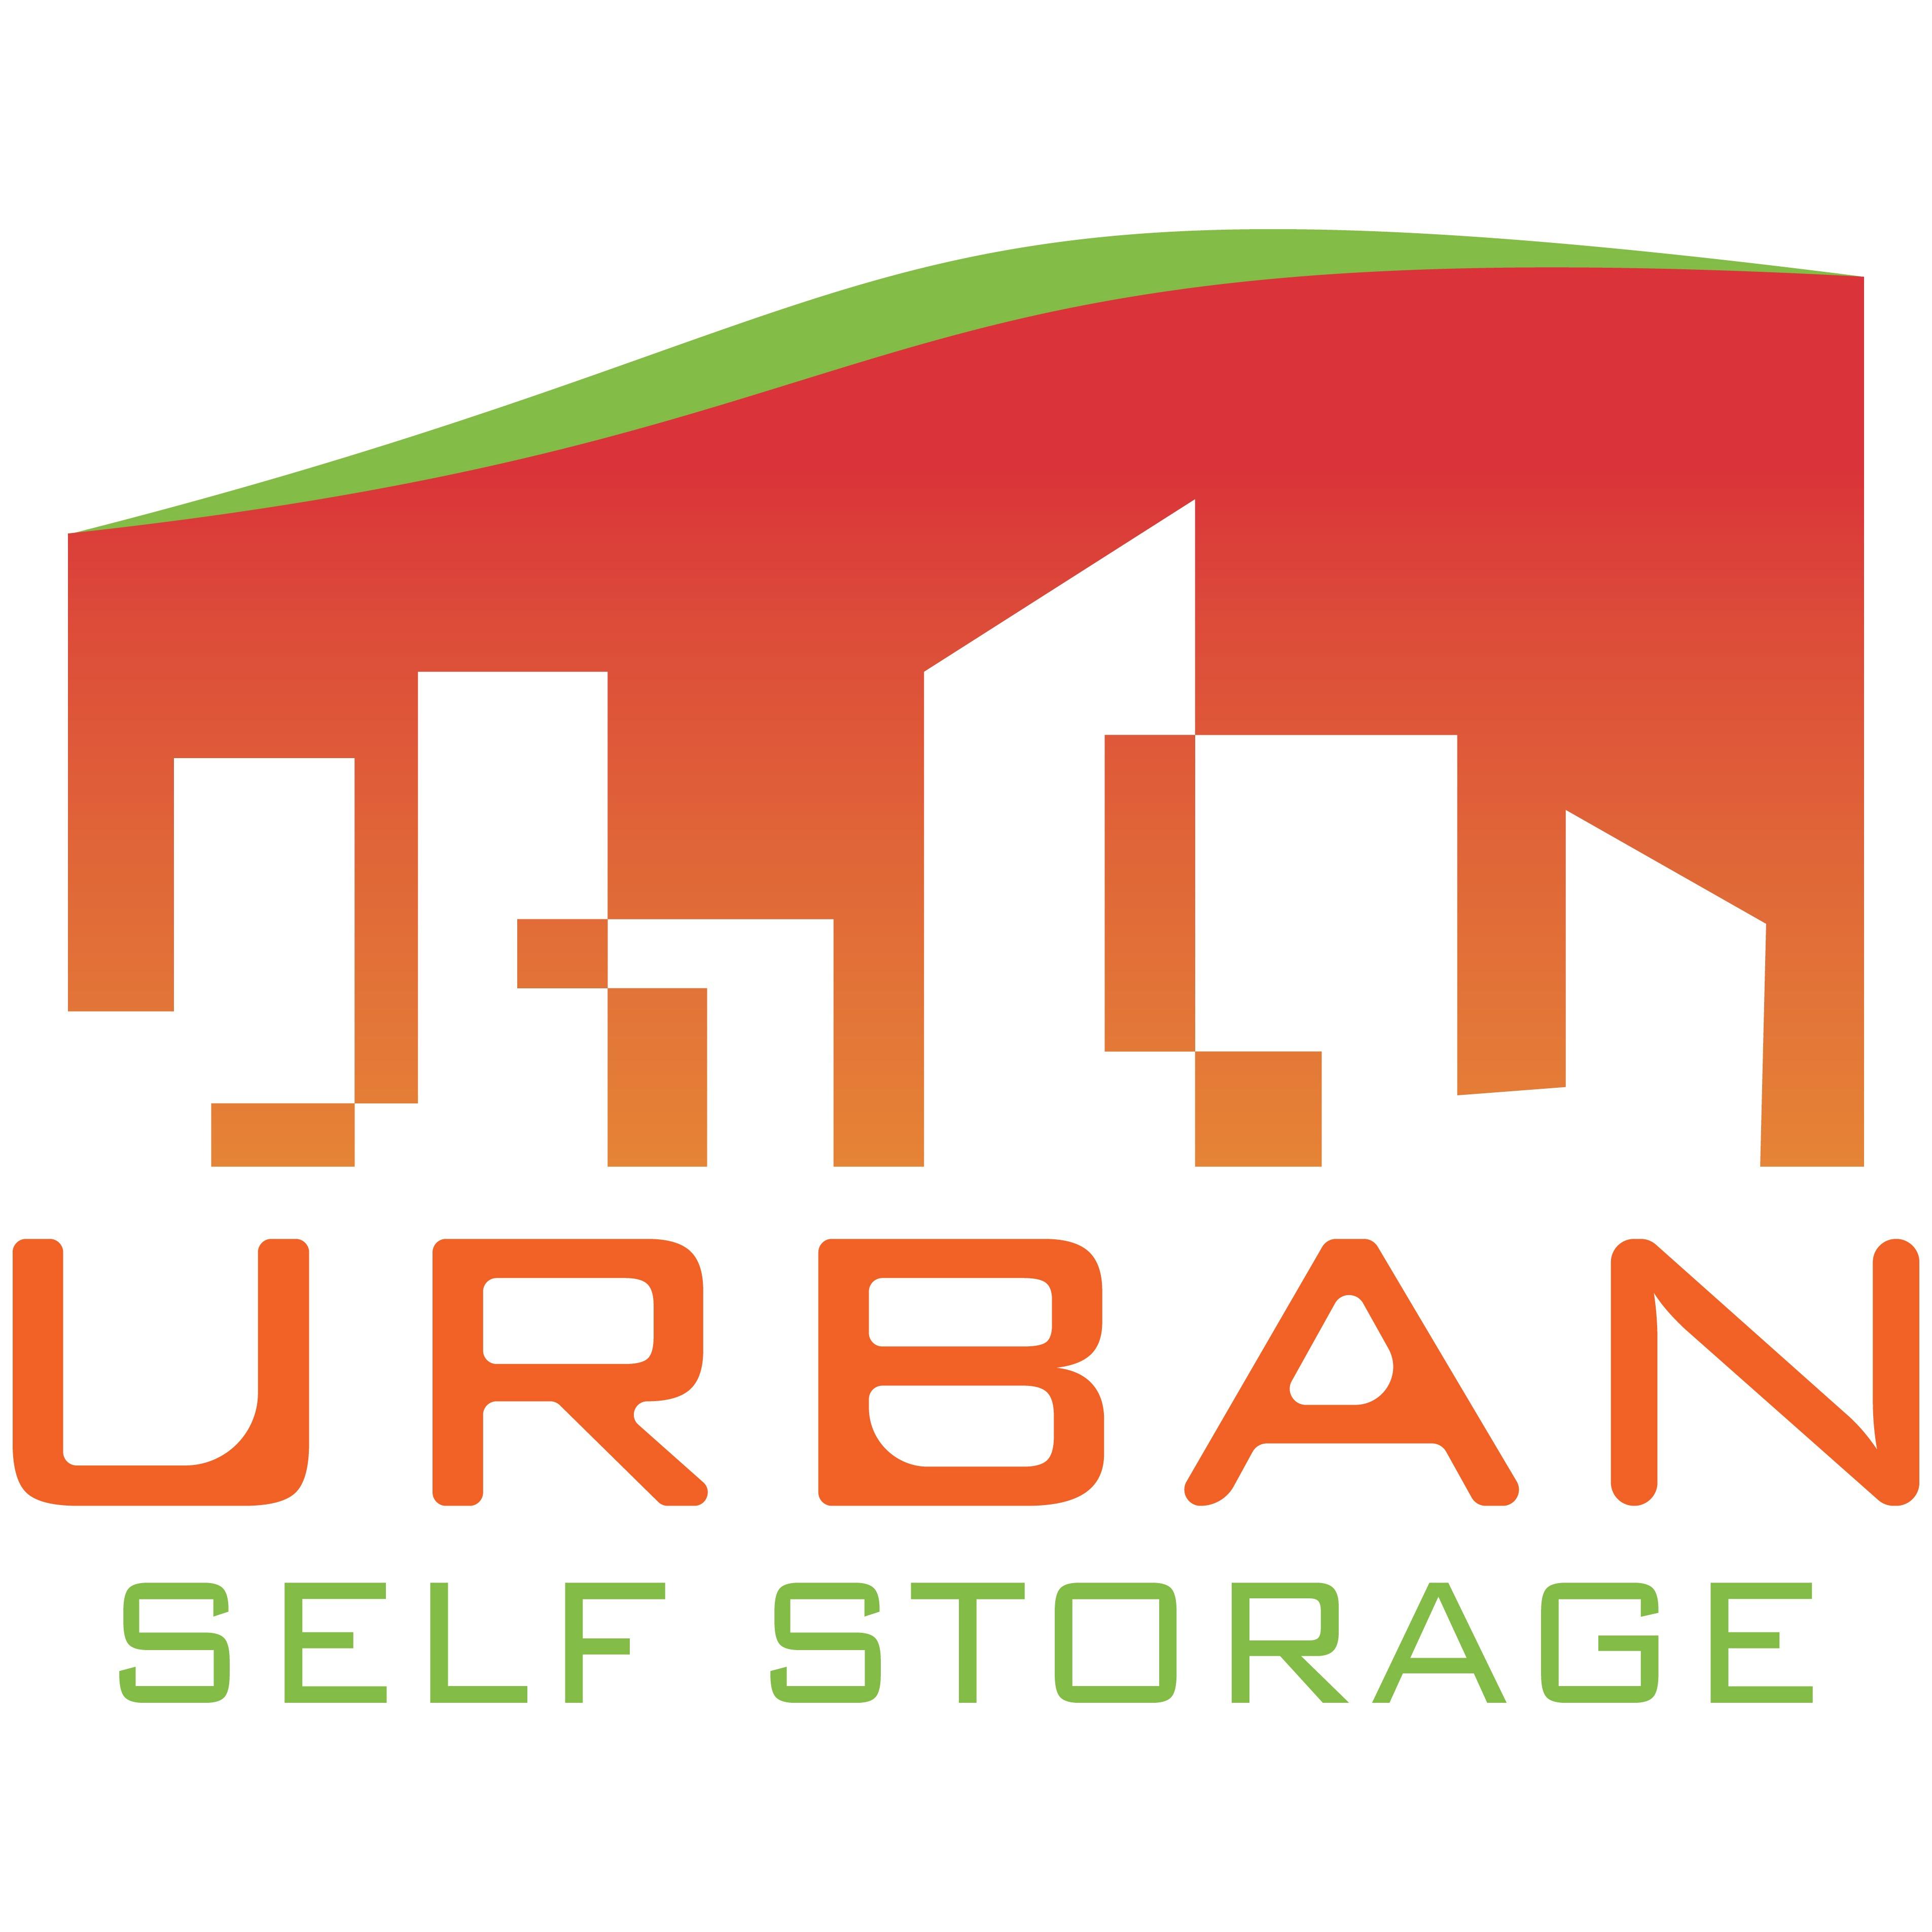 Urban Self Storage - Doral, FL 33122 - (786)453-1420   ShowMeLocal.com